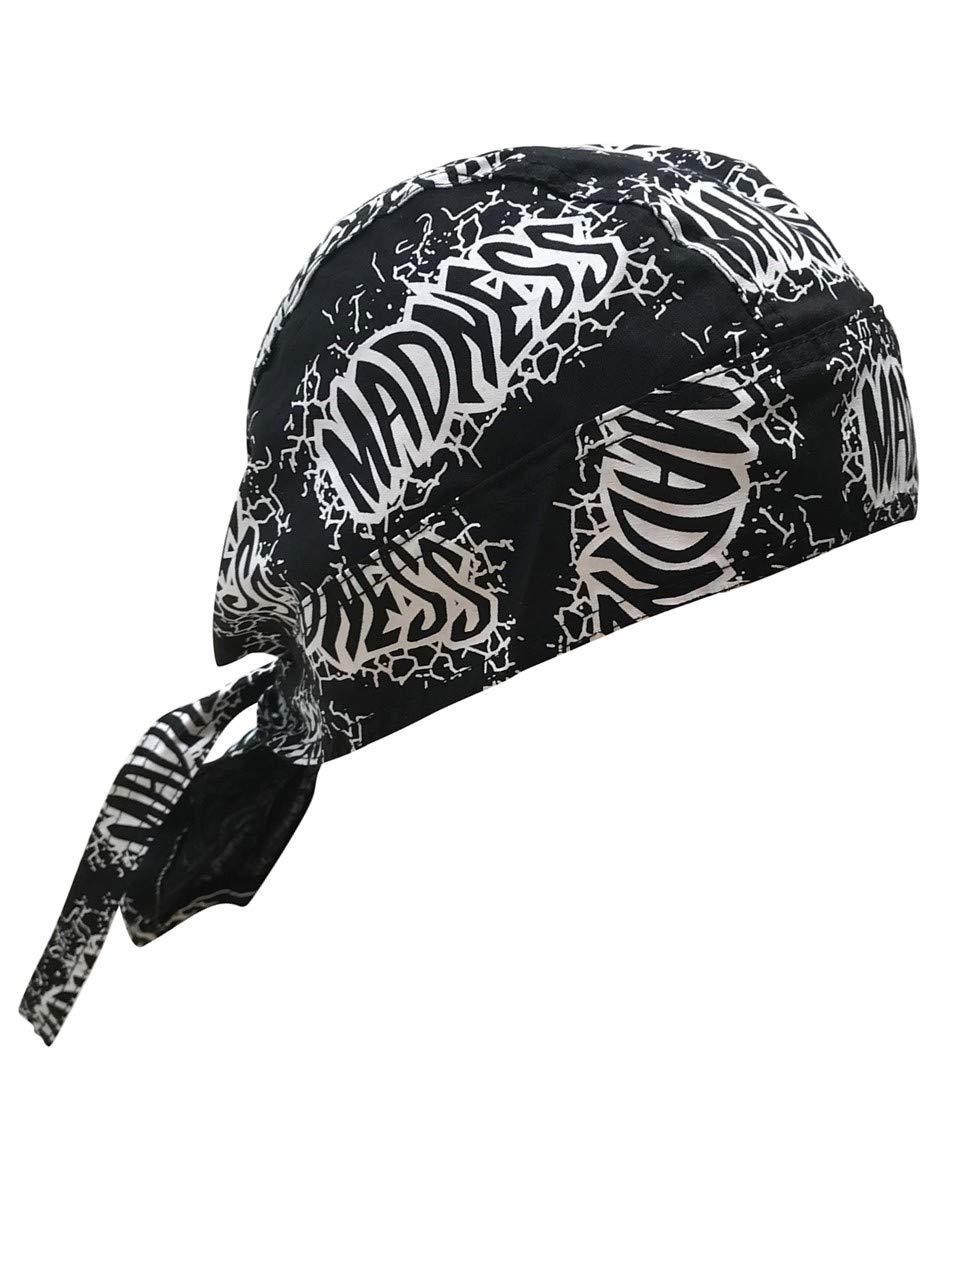 Macho Man Madness Bandana Skull Cap Doo Rag Randy Savage Costume -Black